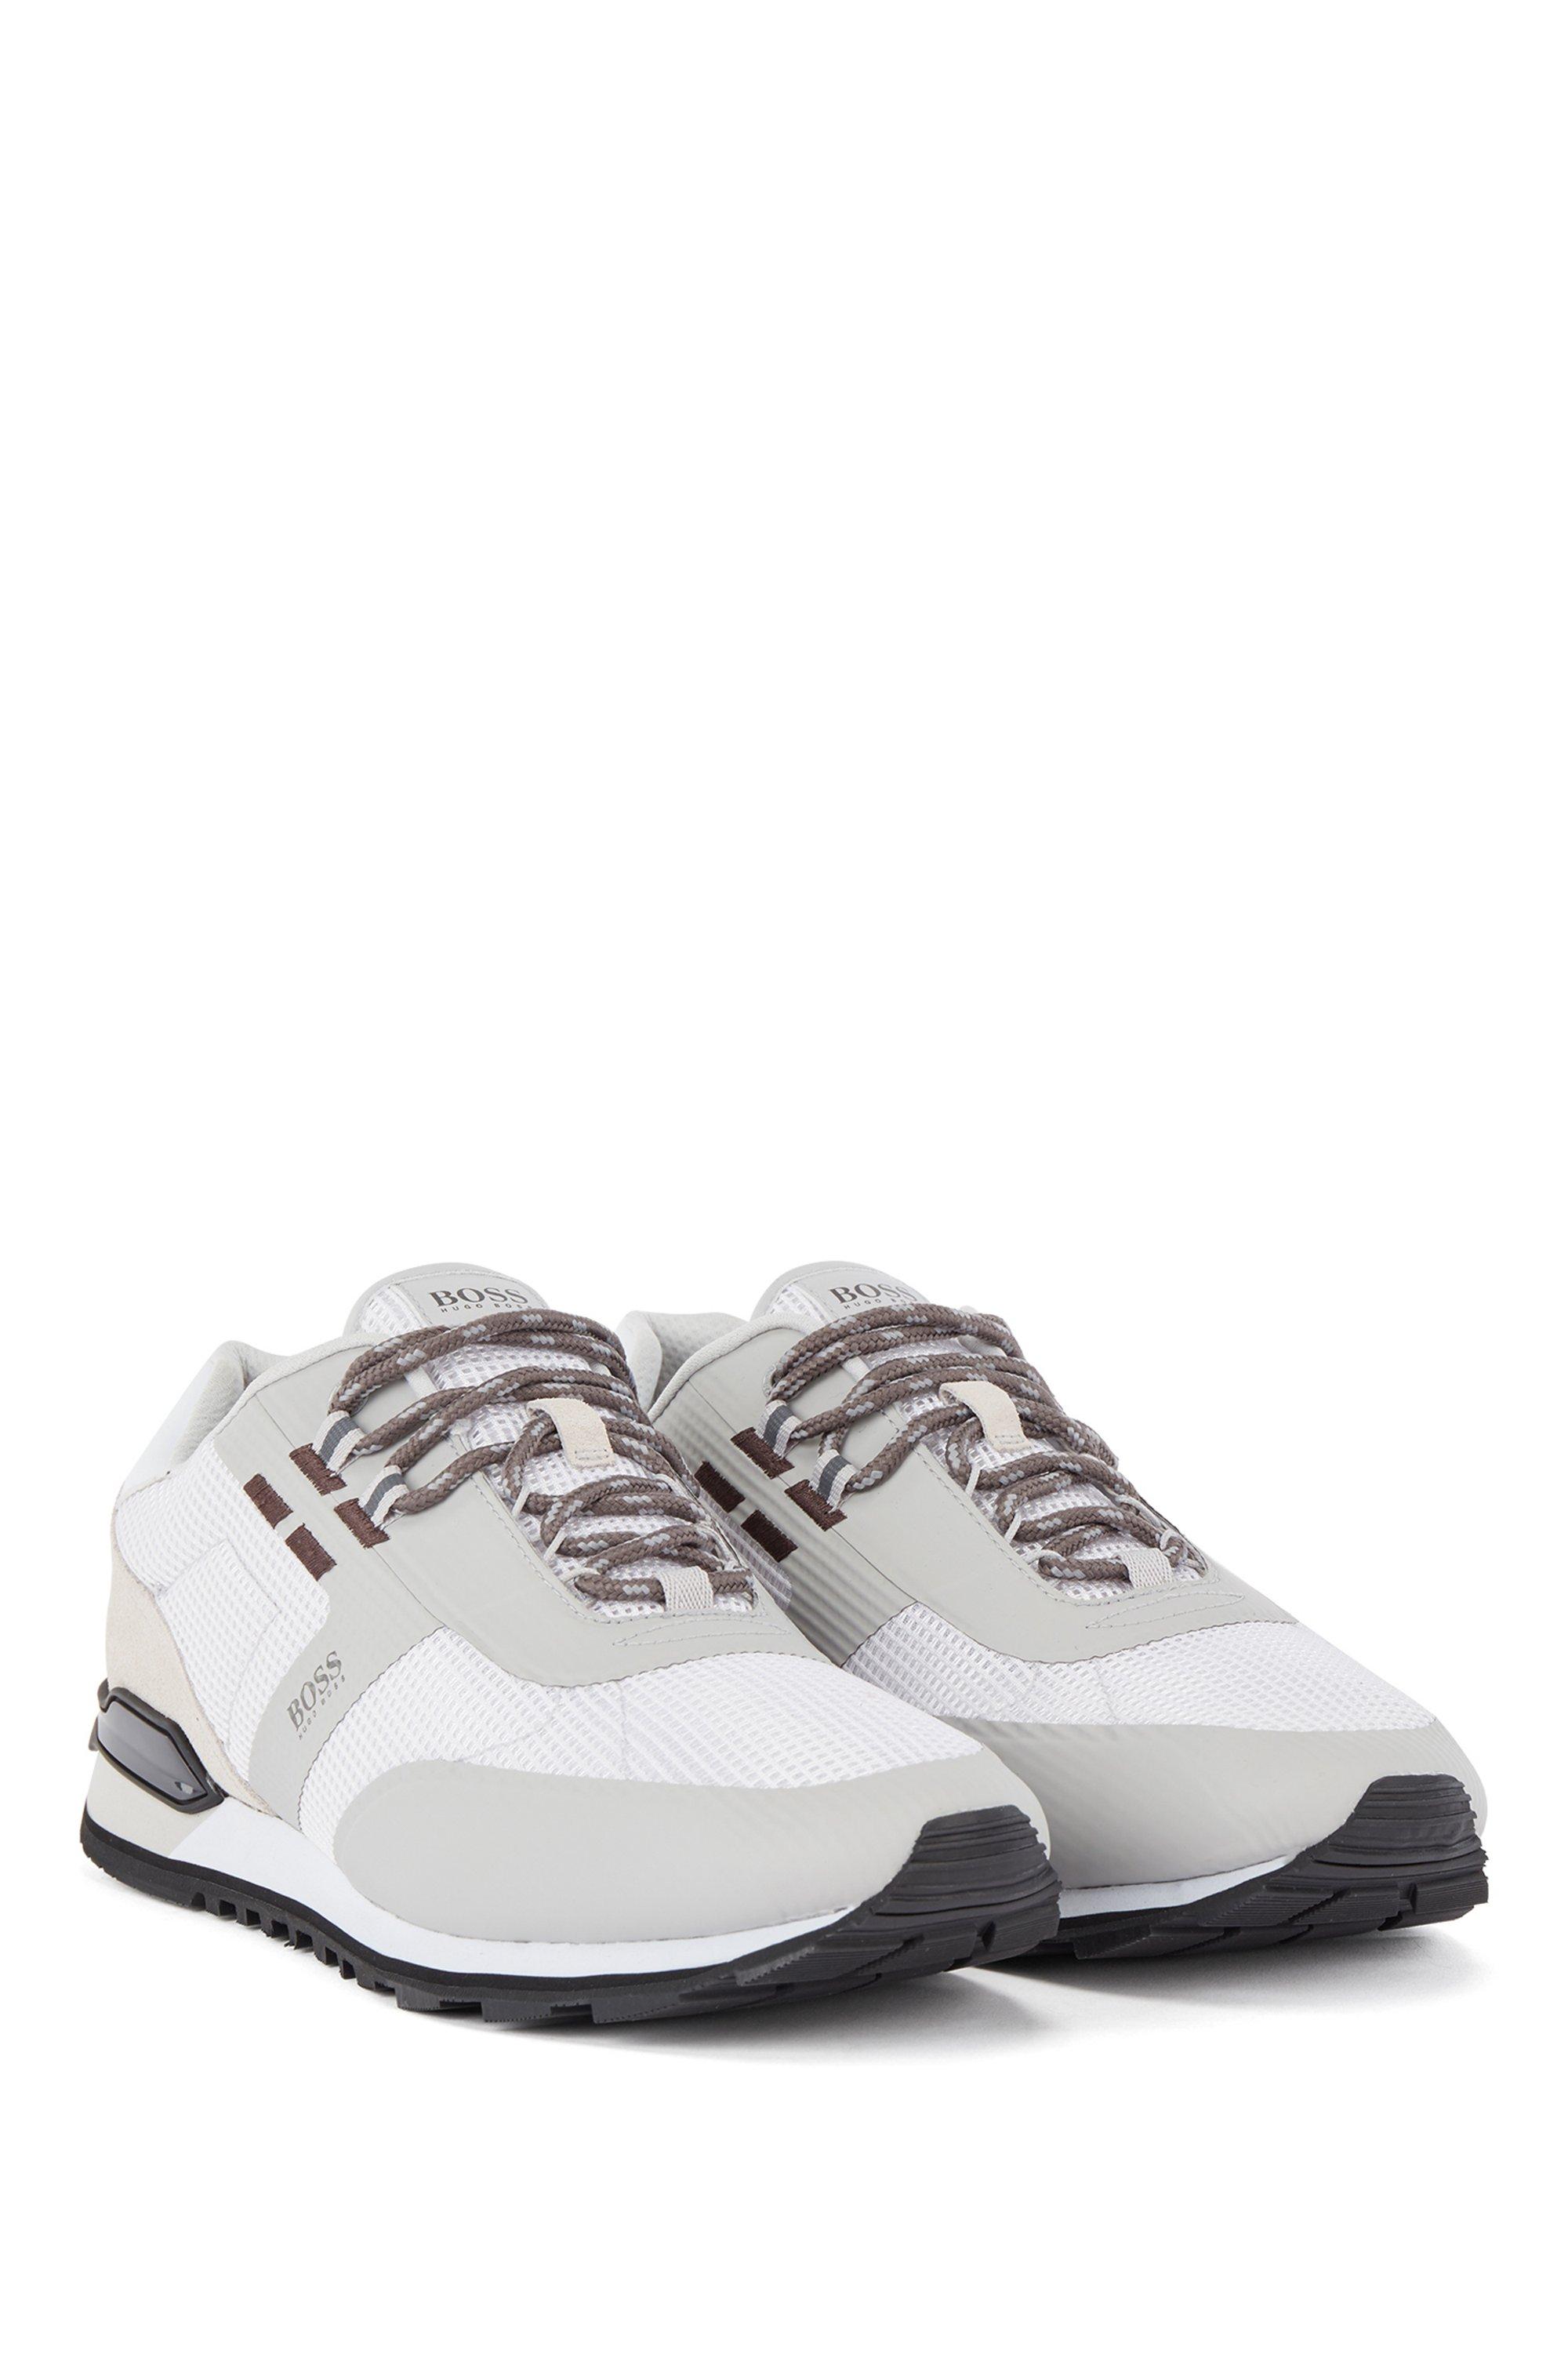 Hybrid-Sneakers aus Nylon, Mesh und Leder